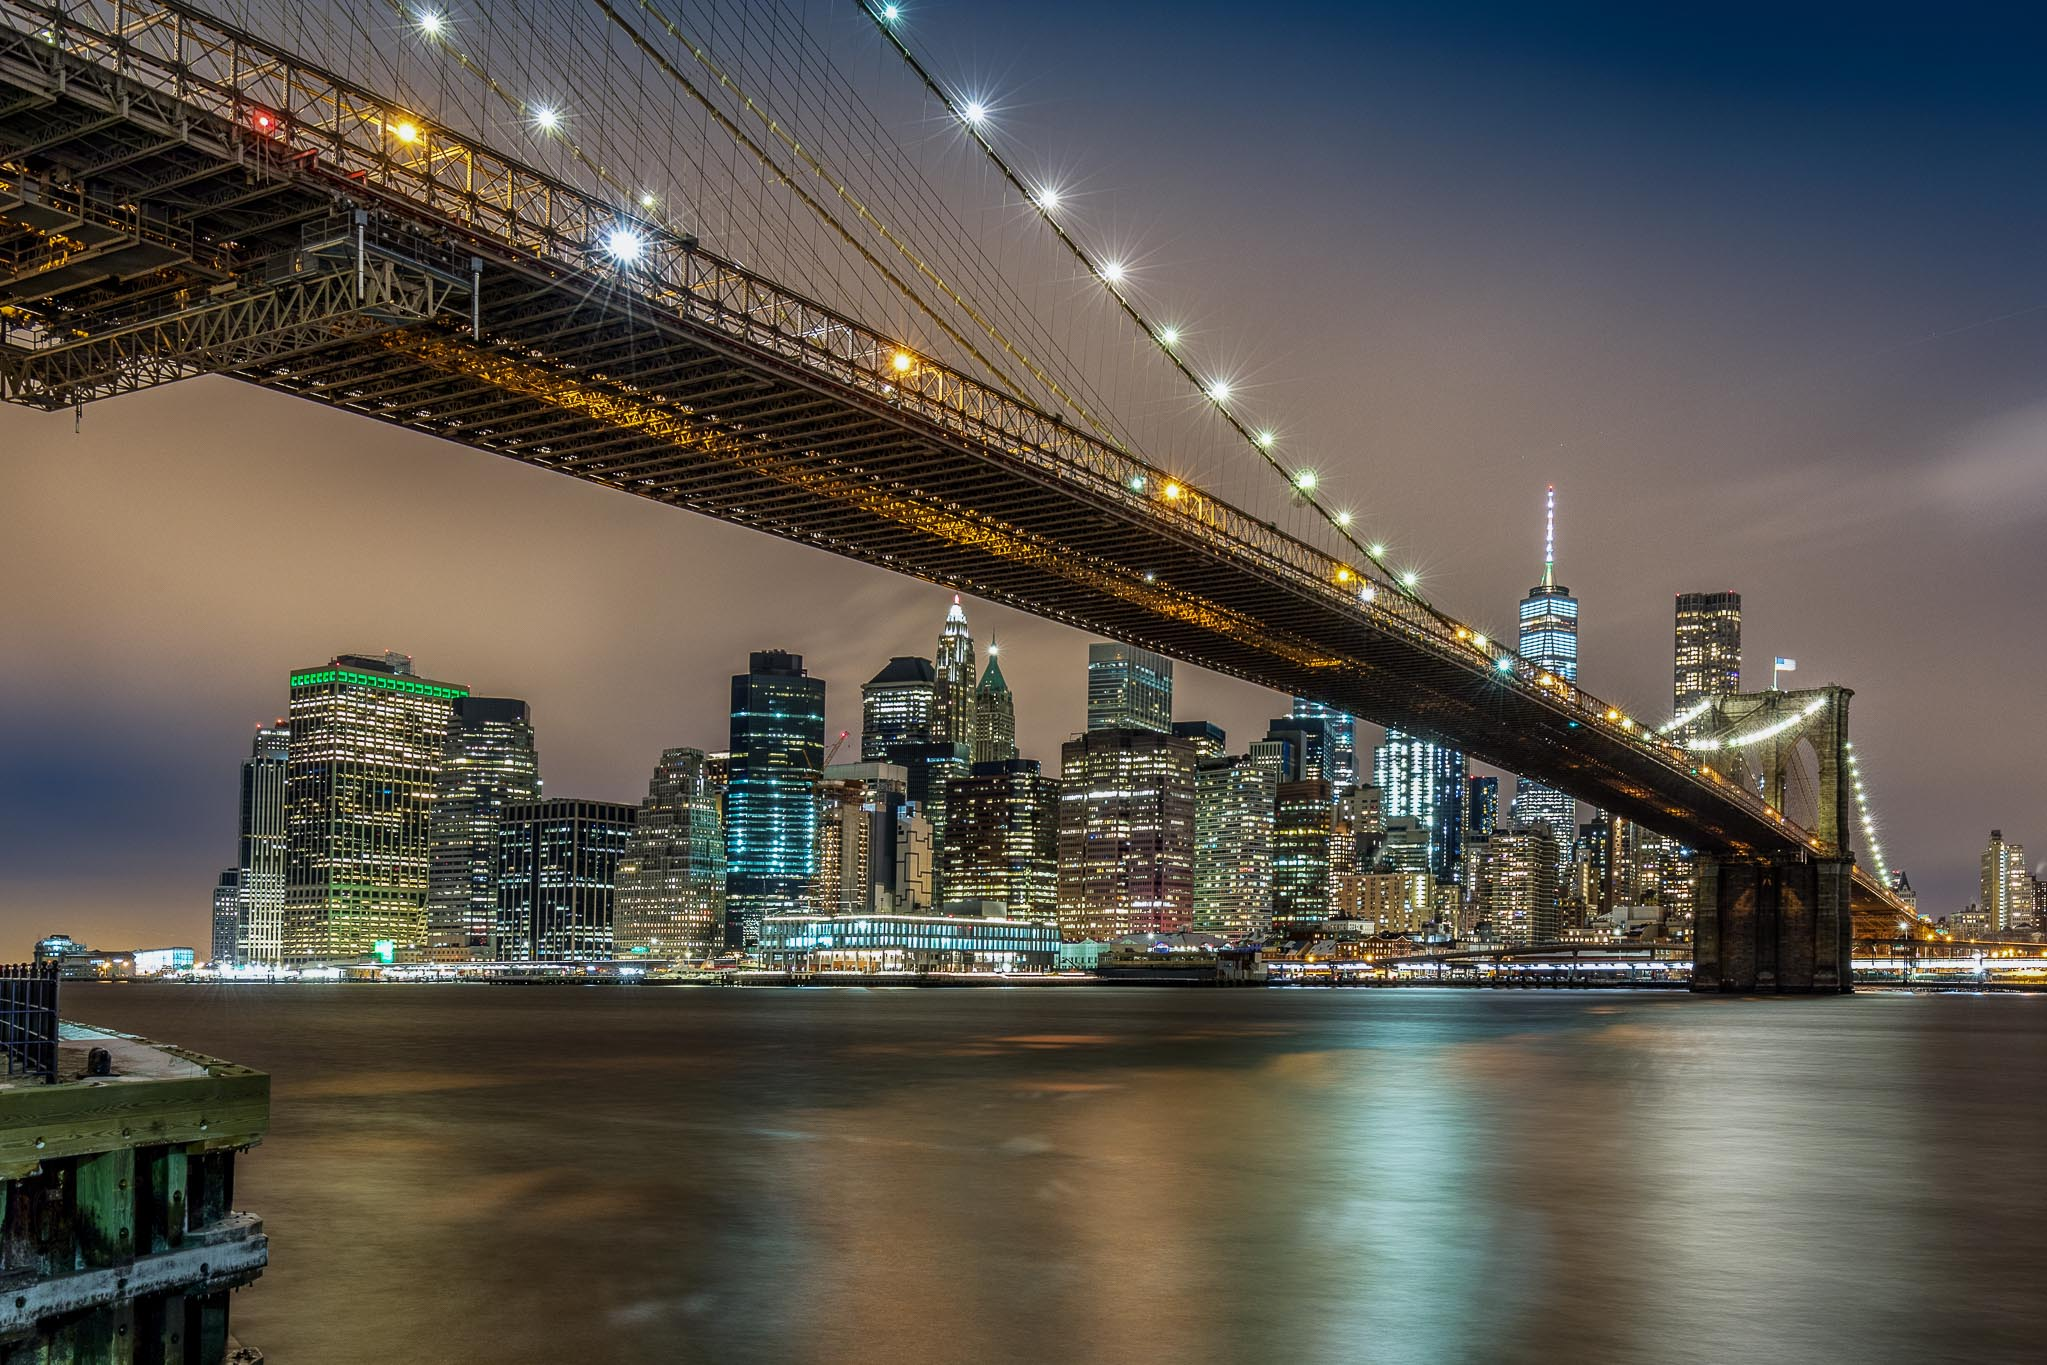 Brooklyn Bridge at Night, fotografiert vom Brooklyn Bridge Park aus, Fotoreise New York